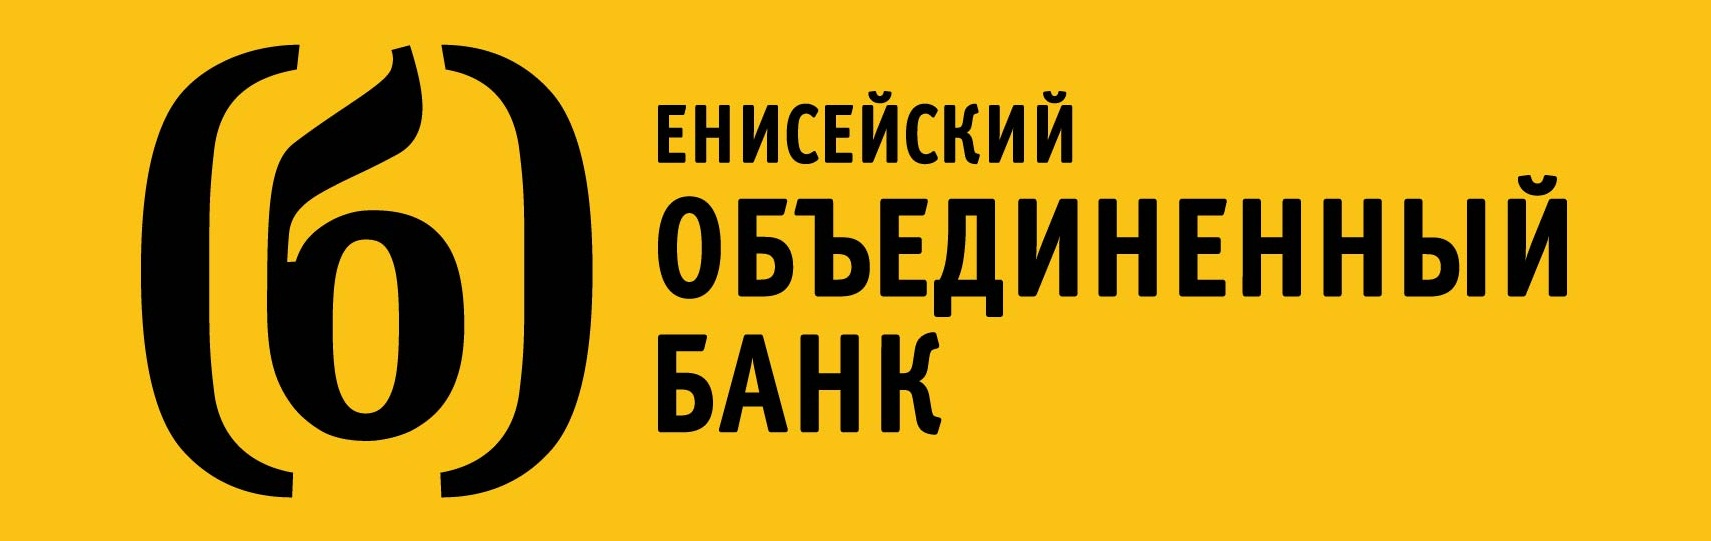 http://medpalata.kkgvv.ru/upload/LogoYellow.jpg